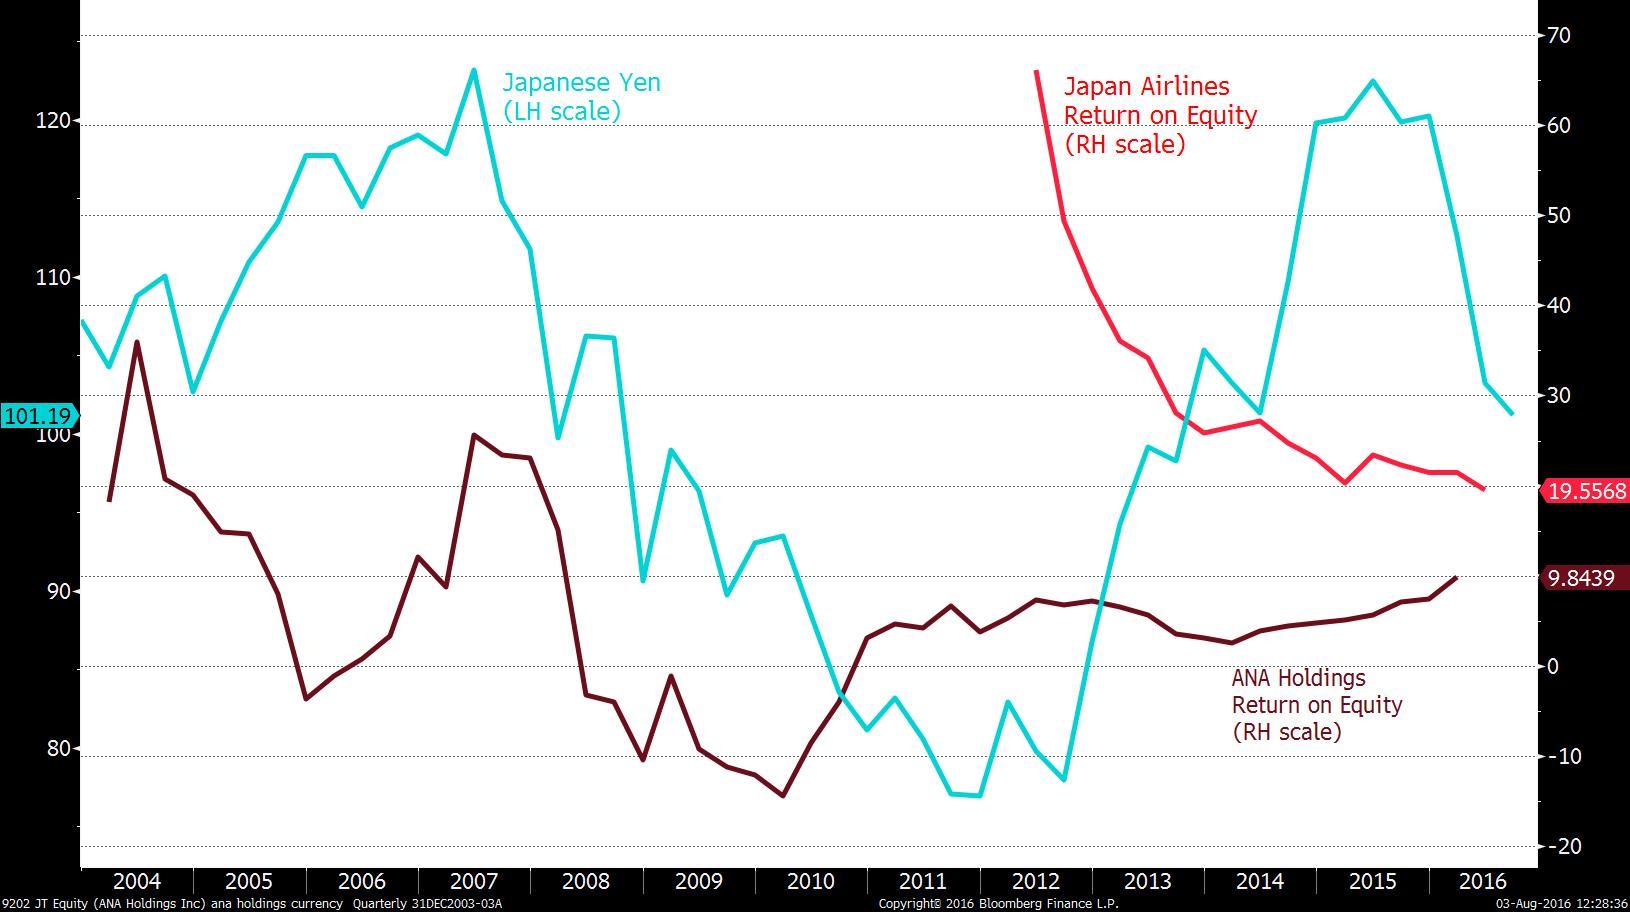 Yen vs ANA and JAL return on equity